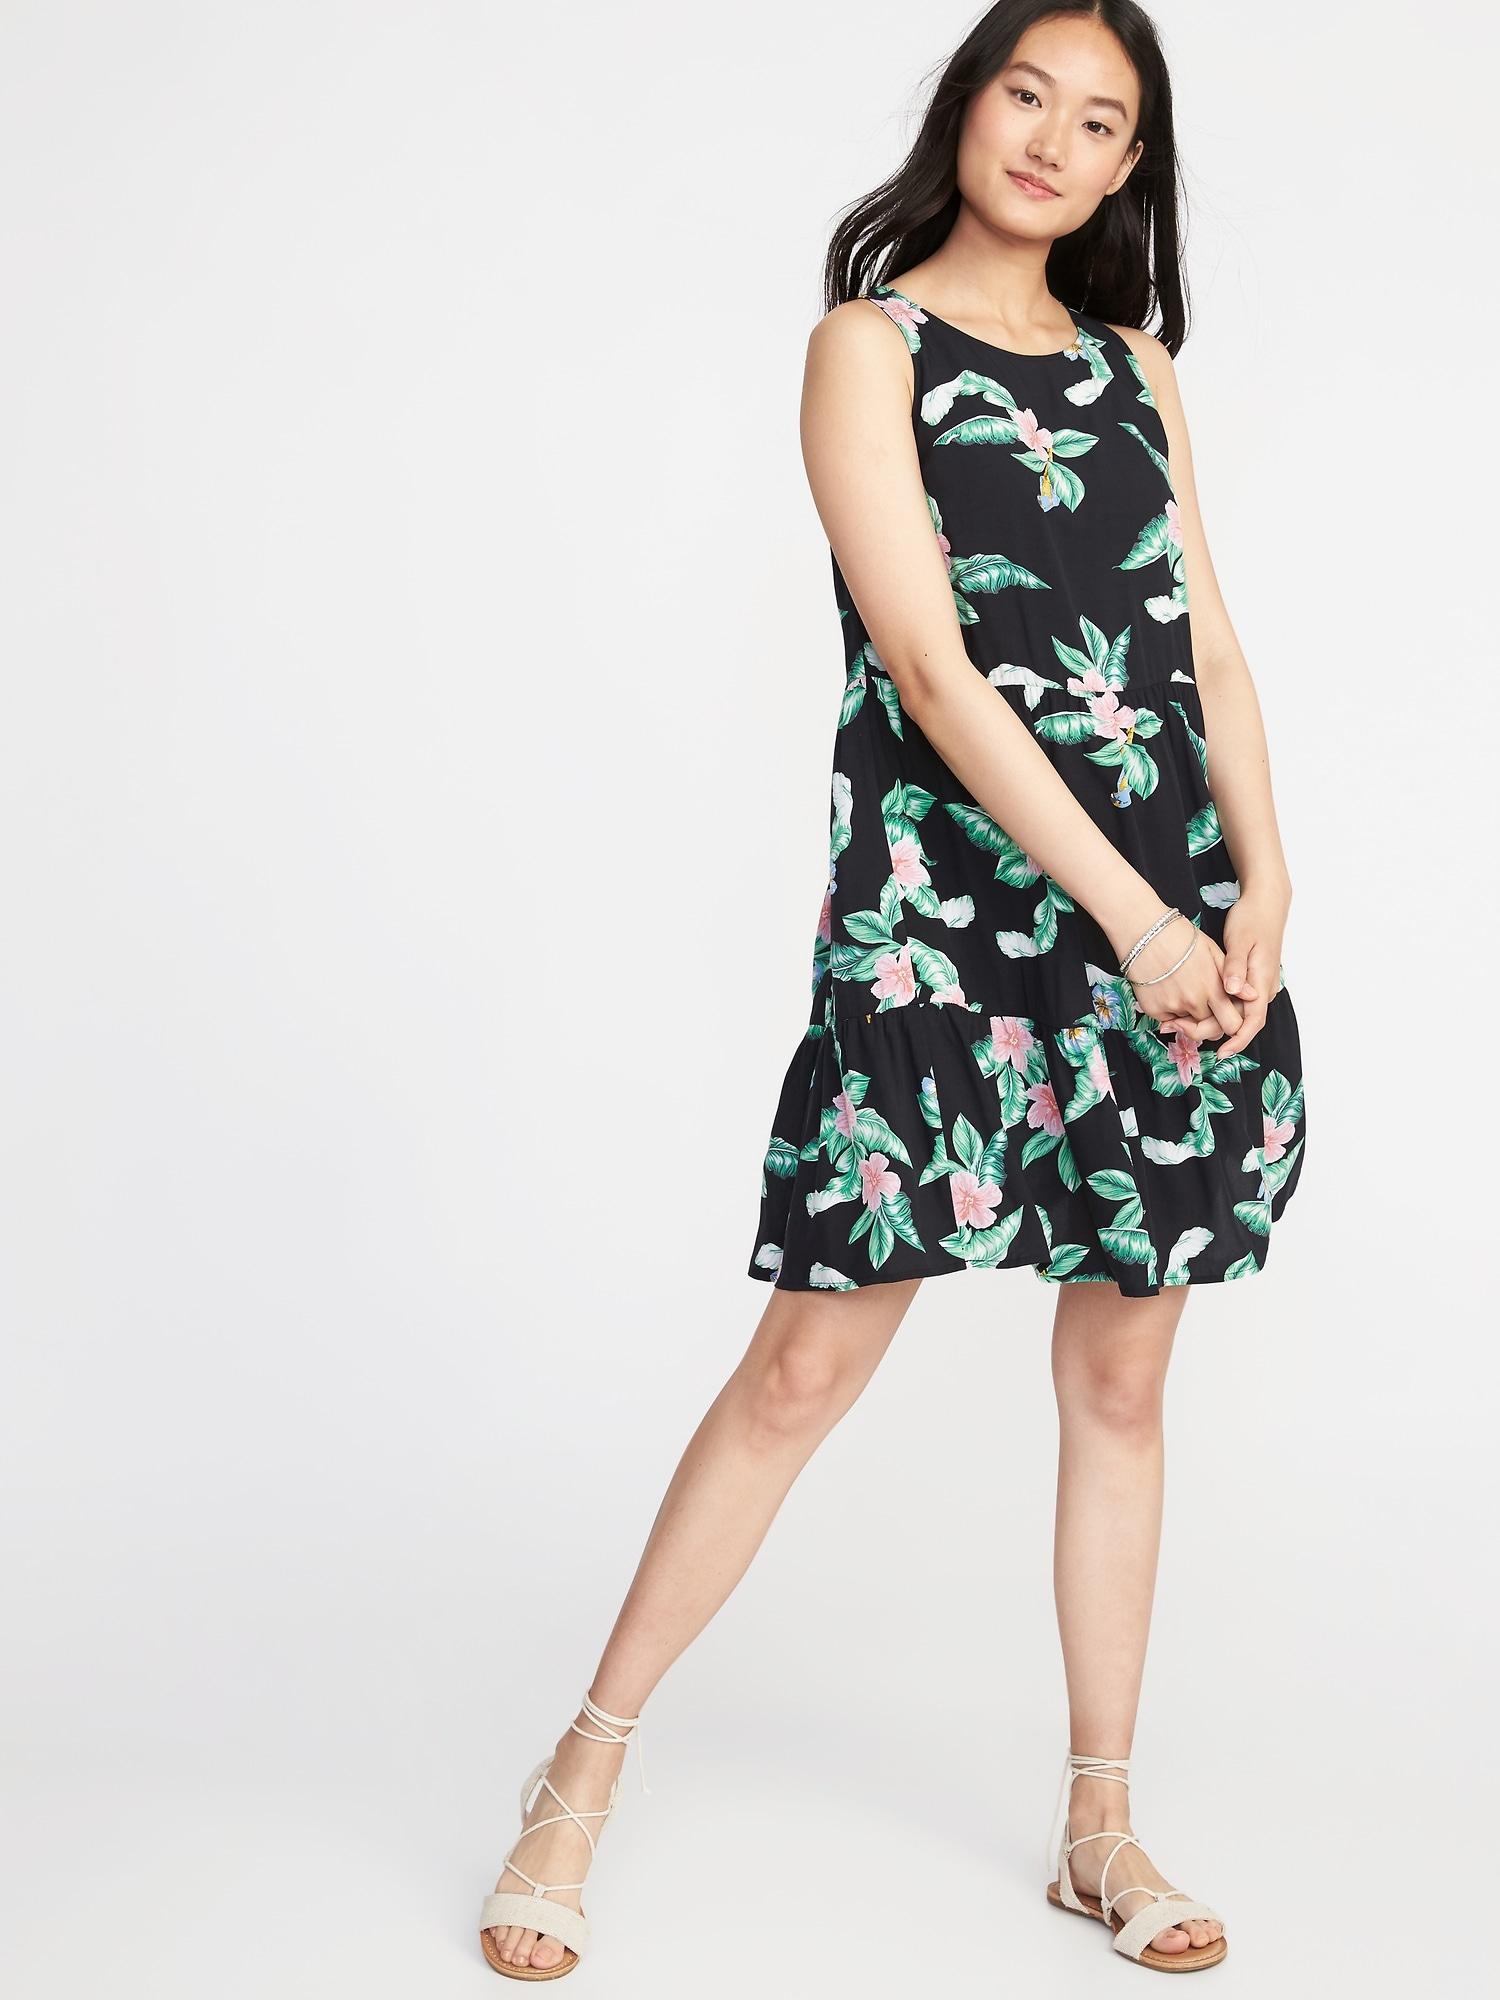 004260e9f1446 Sleeveless Tiered Swing Dress for Women